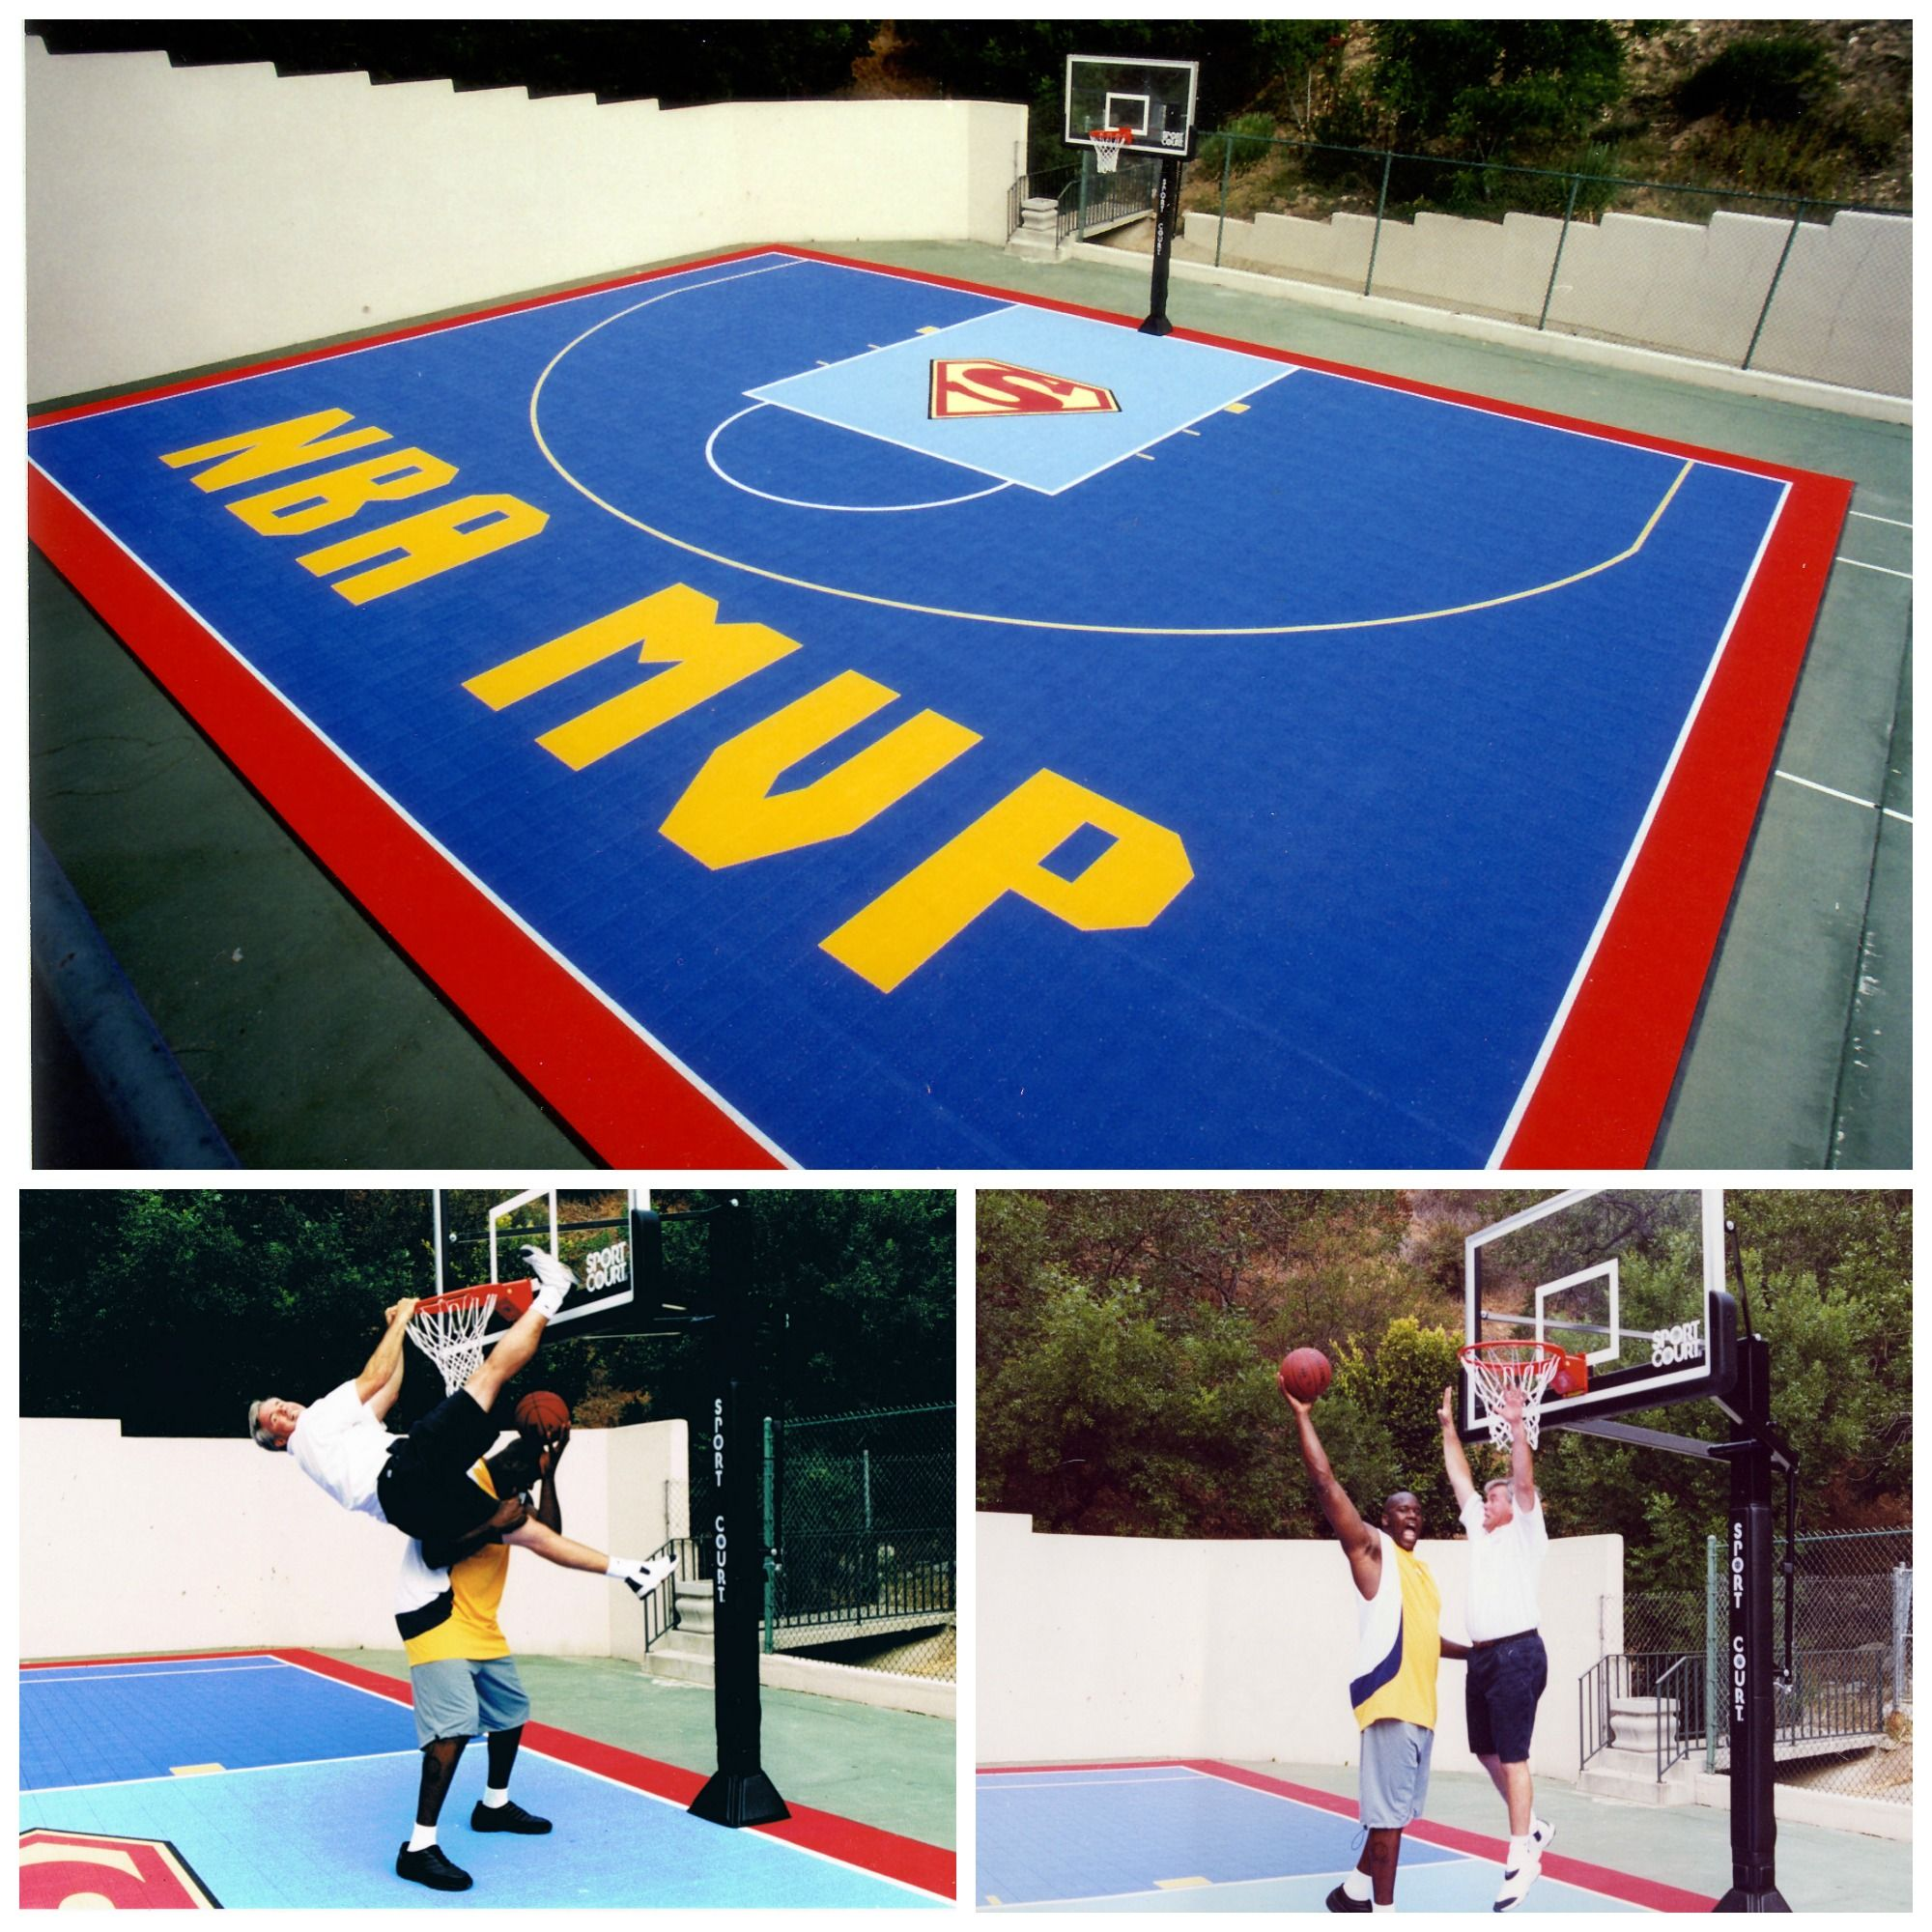 shaq loves his custom half court basketball in his backyard